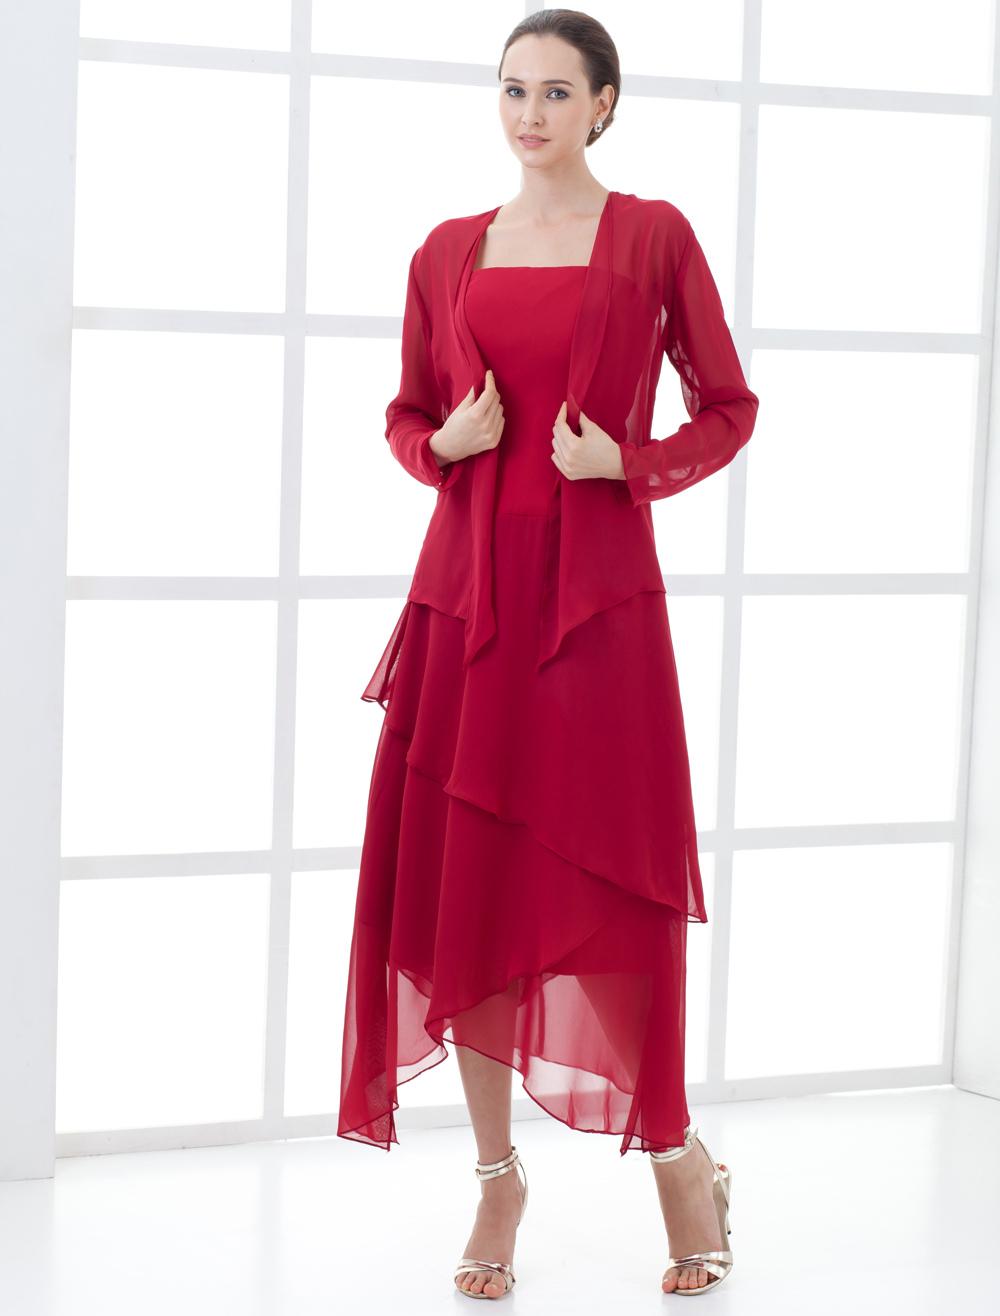 Elegant Wine Red Chiffon Mother Of The Bride Dress Wedding Guest Dress